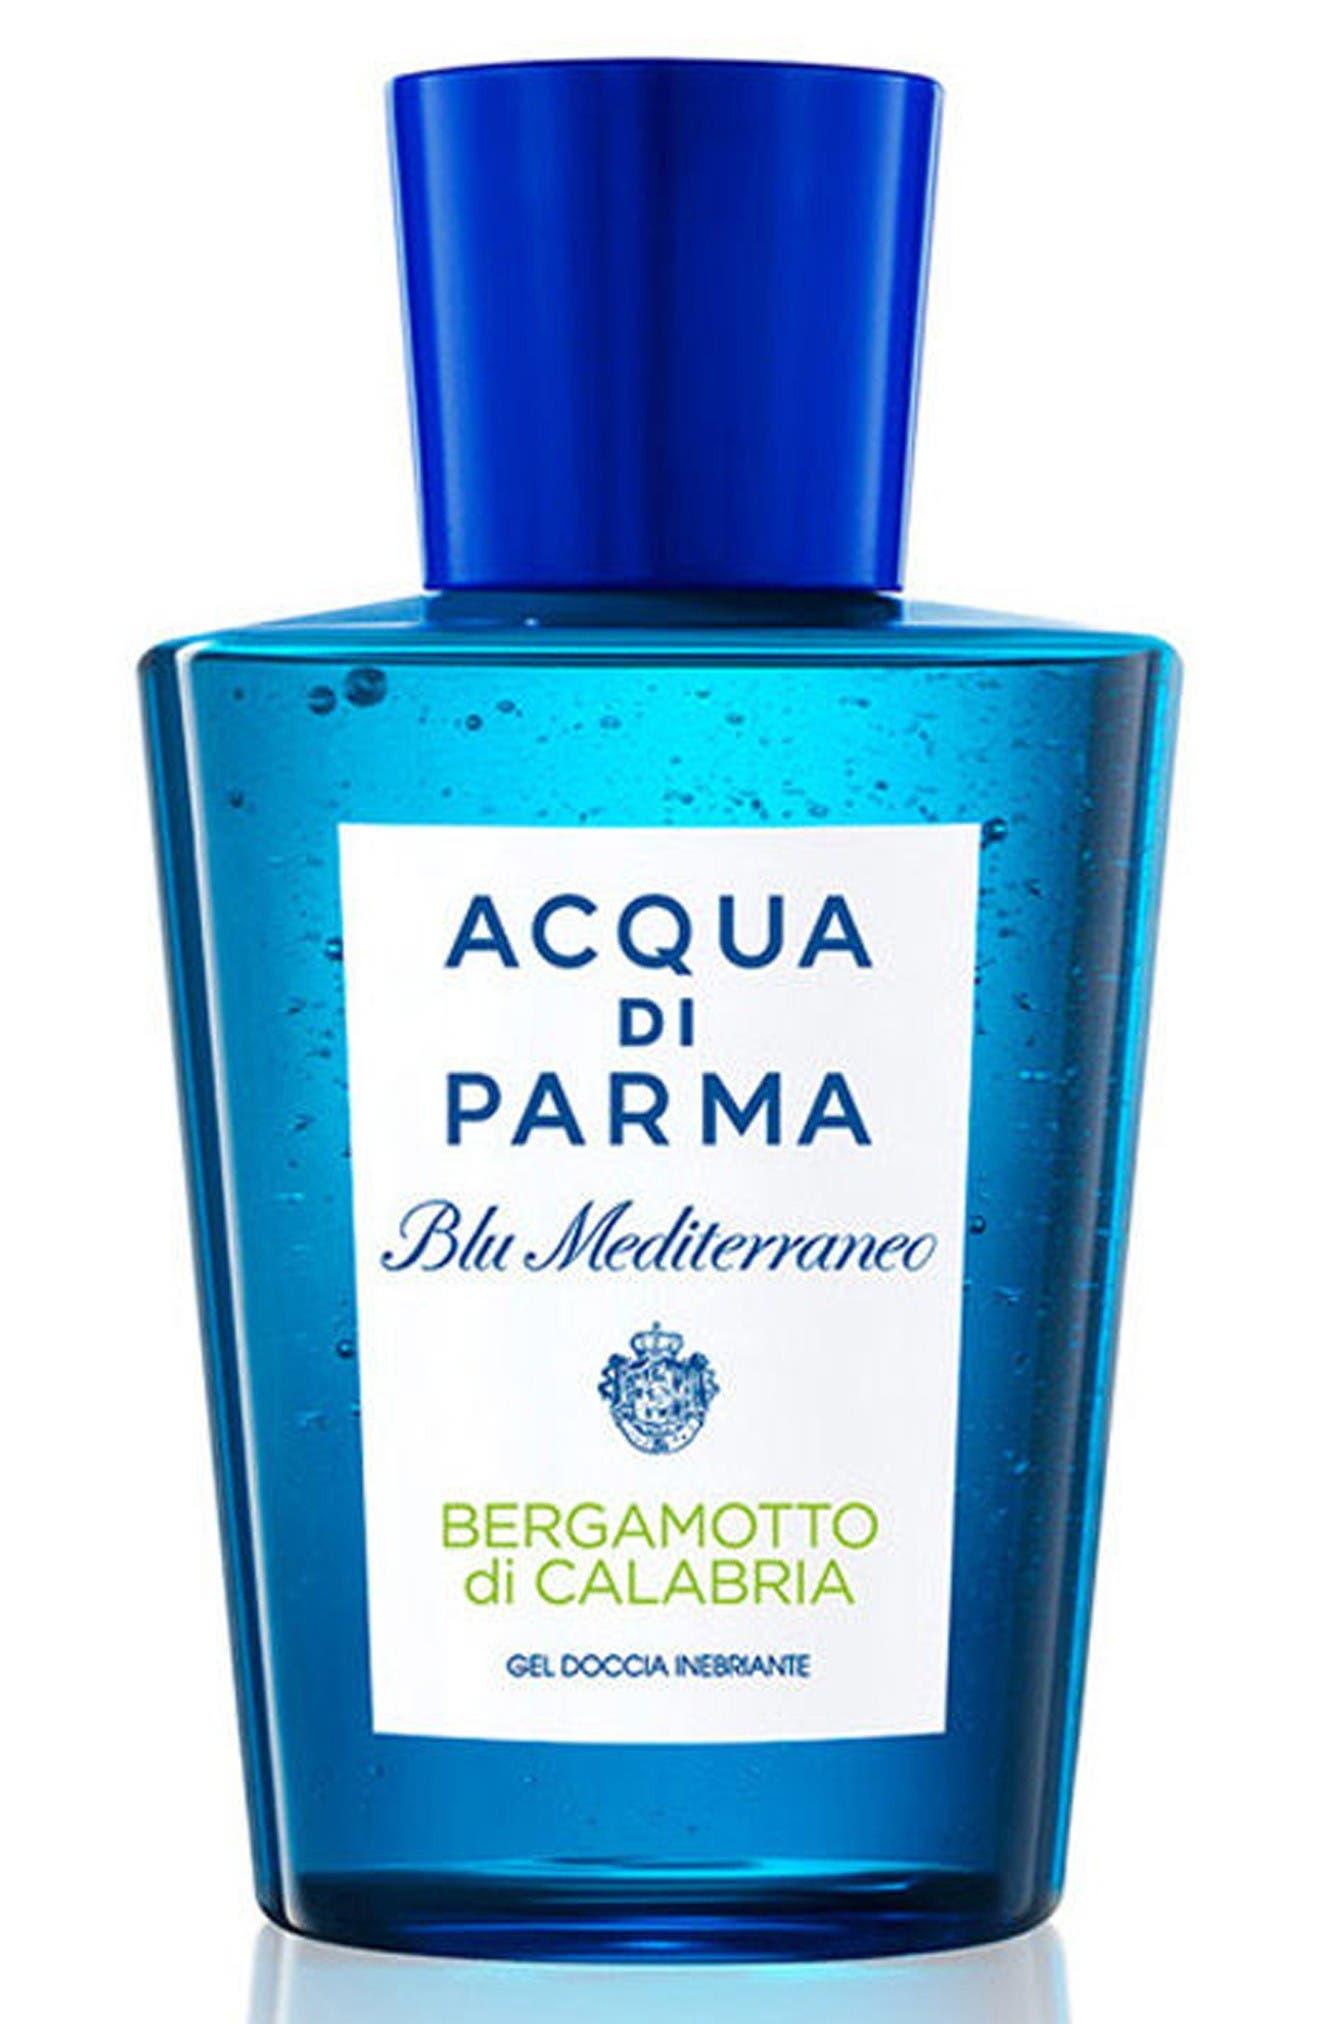 Main Image - Acqua di Parma 'Blu Mediterraneo - Bergamotto di Calabria' Shower Gel